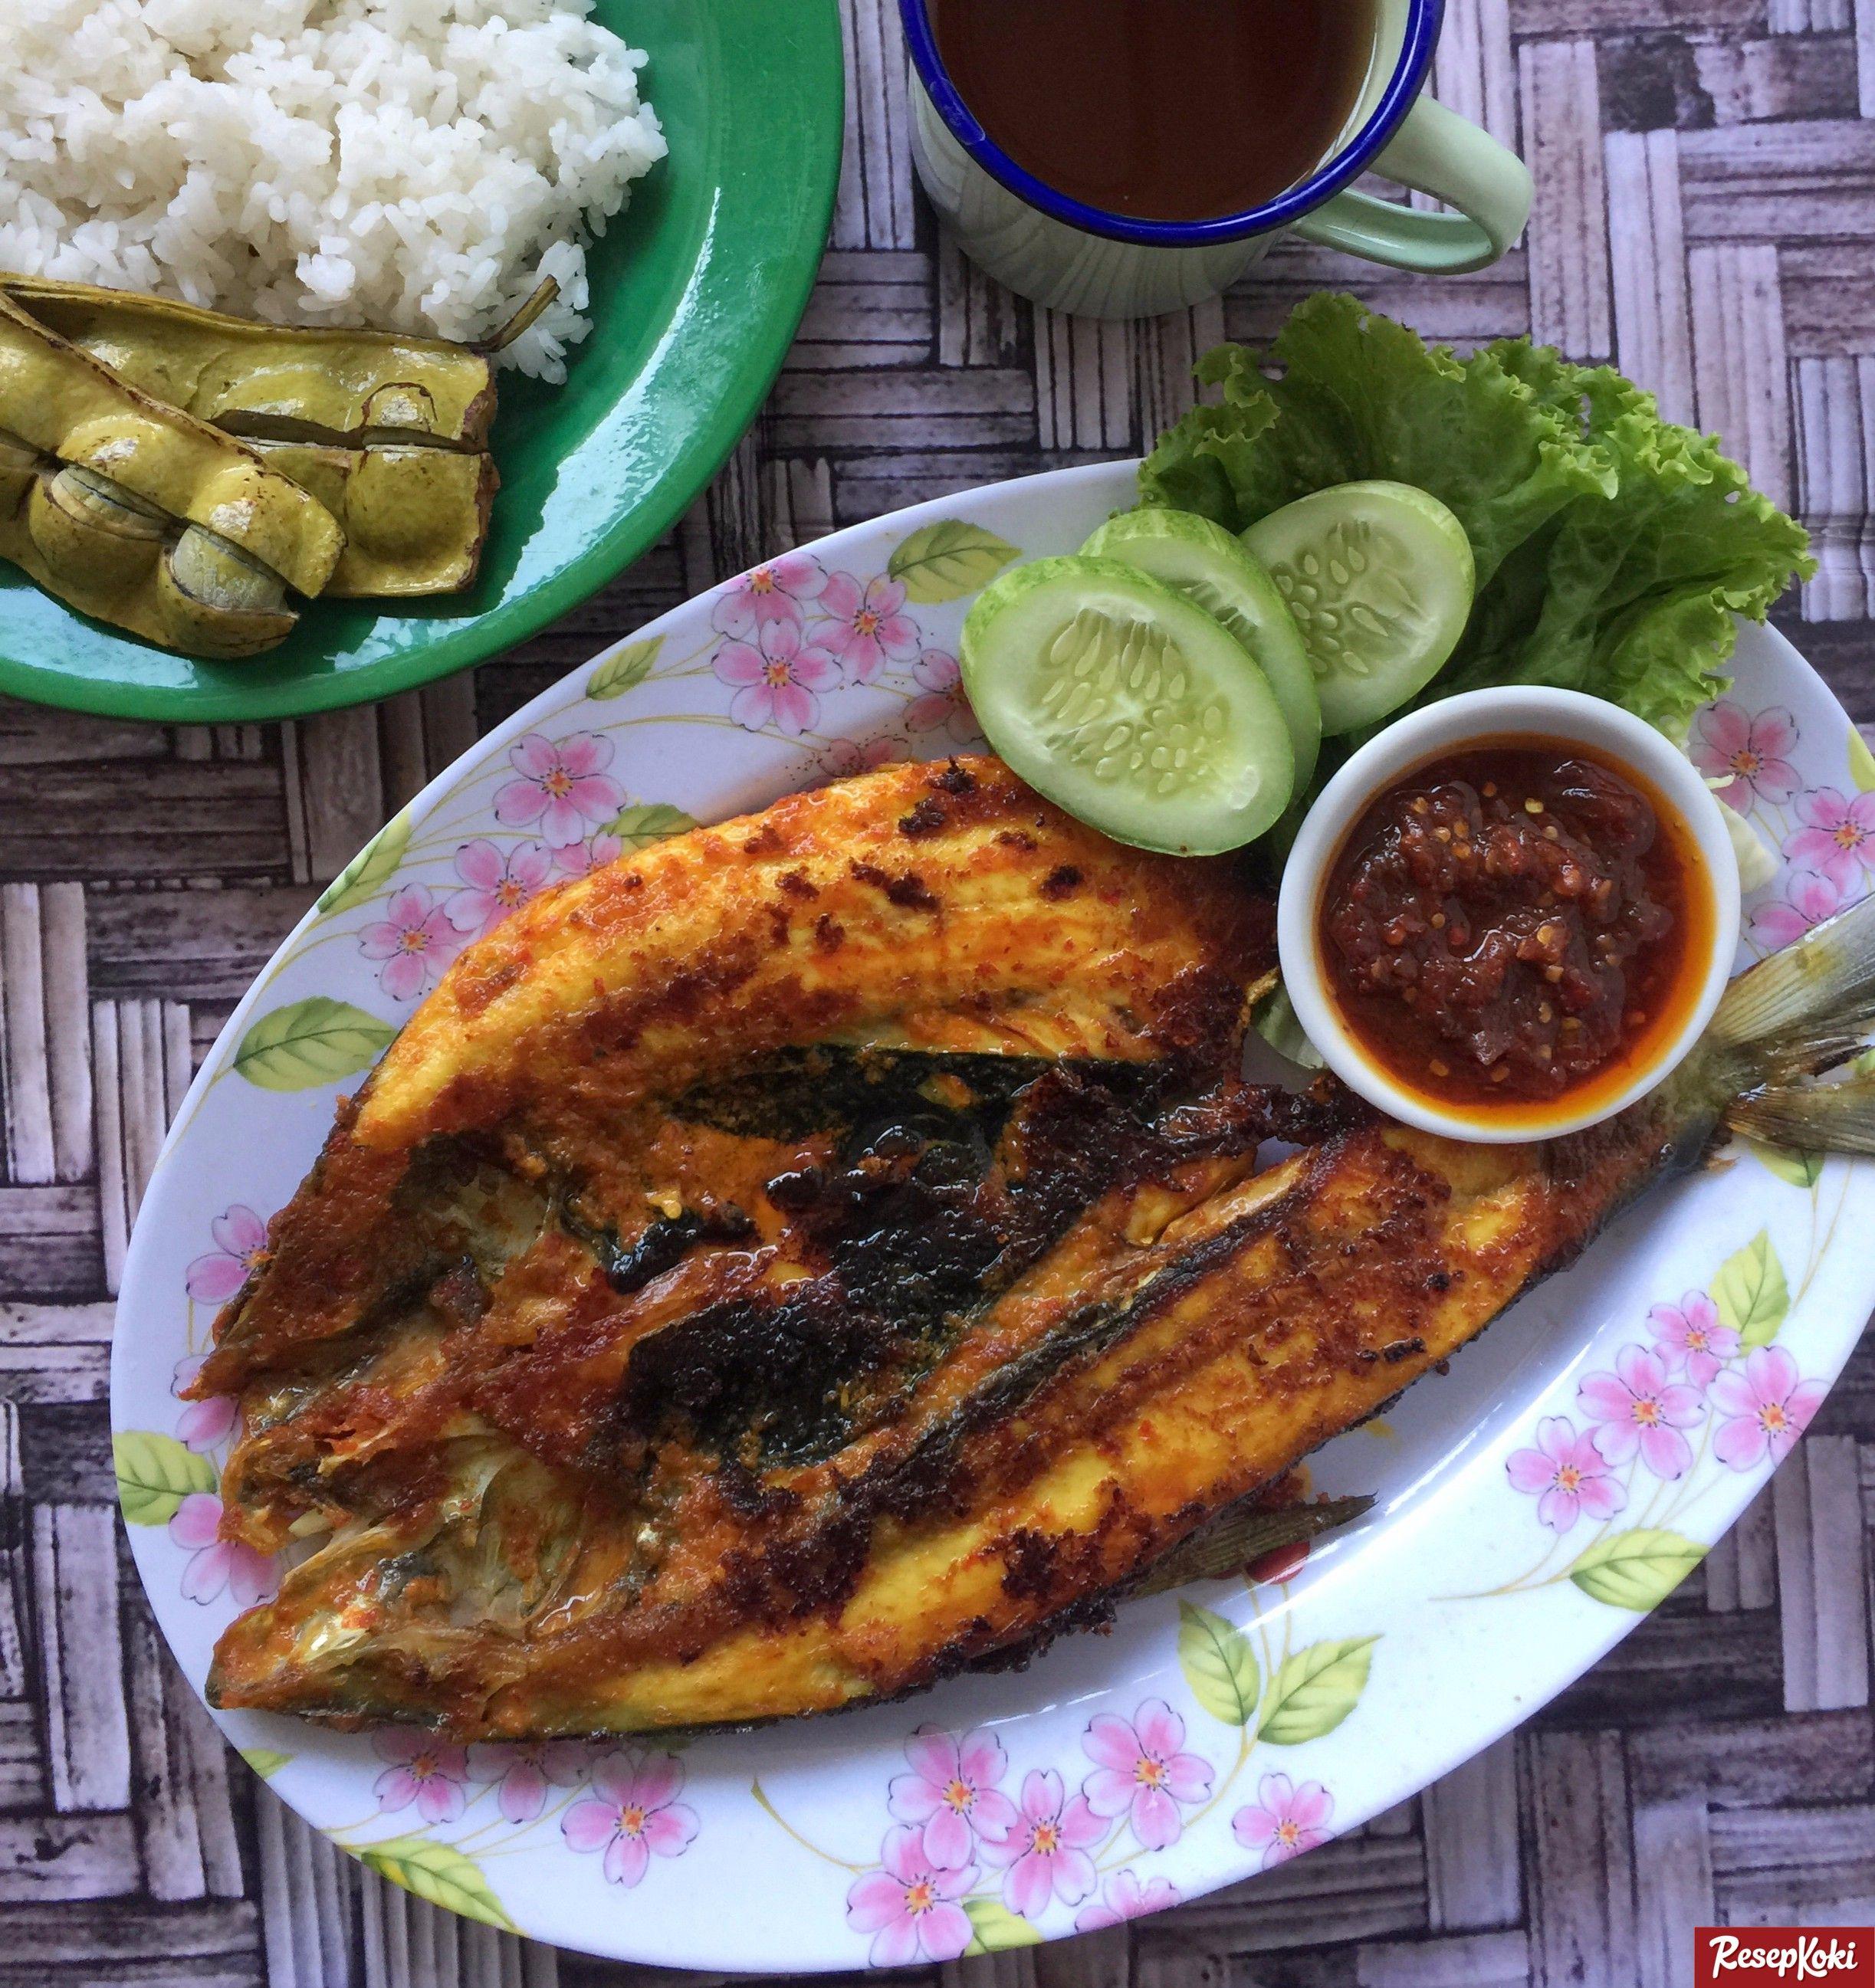 Bandeng Bakar Legit Enak Lembut Praktis Resep Resepkoki Resep Di 2020 Resep Makanan Resep Ikan